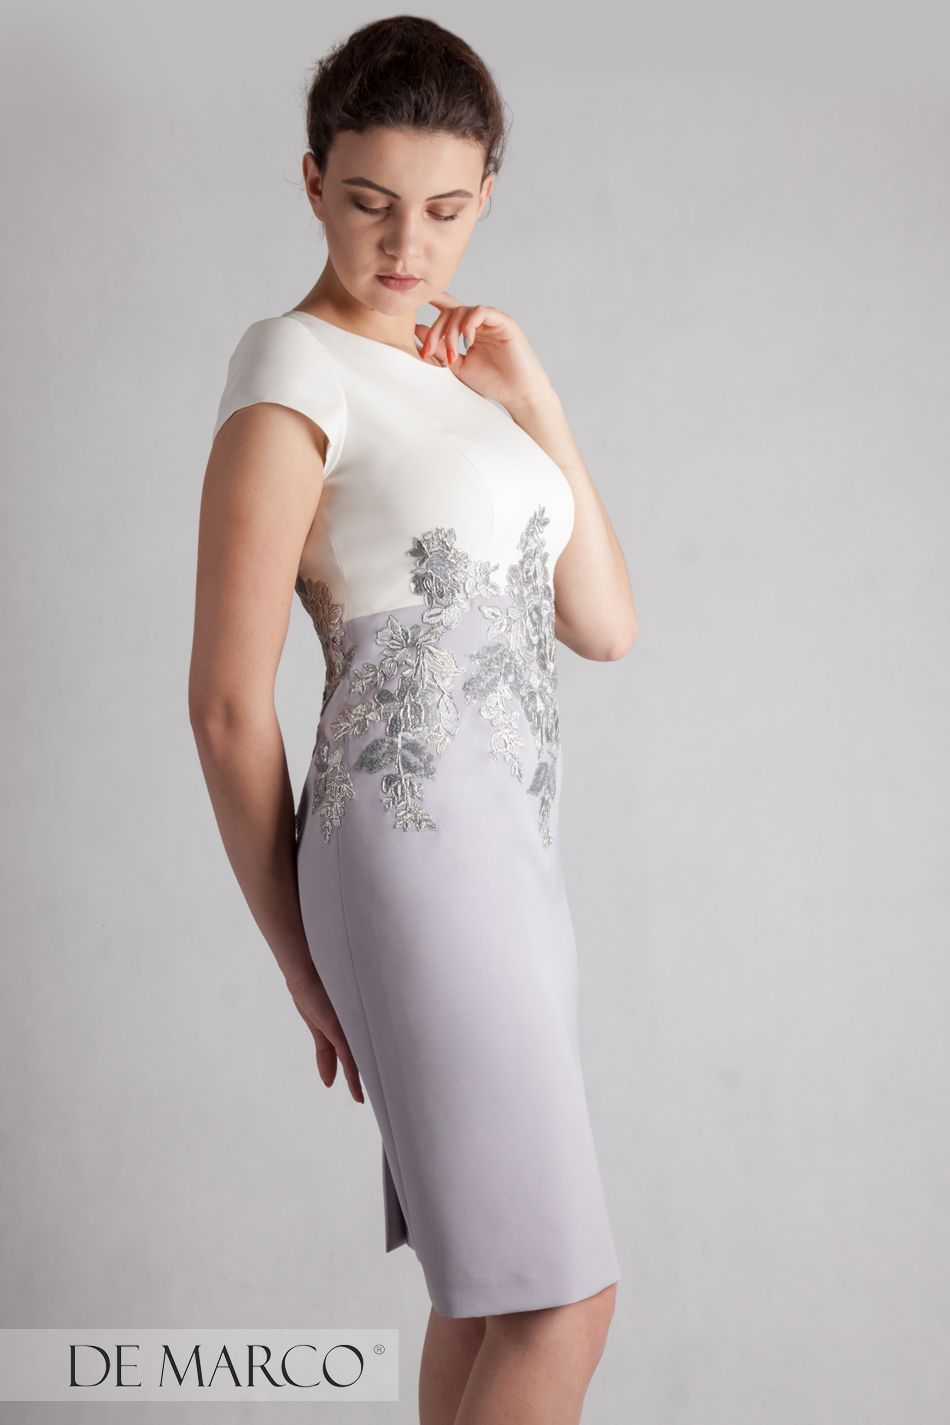 50fa9b9e3c Stylizacja dla mamy pana młodego   młodej pani. Sukienka na wesele 2019   demarco